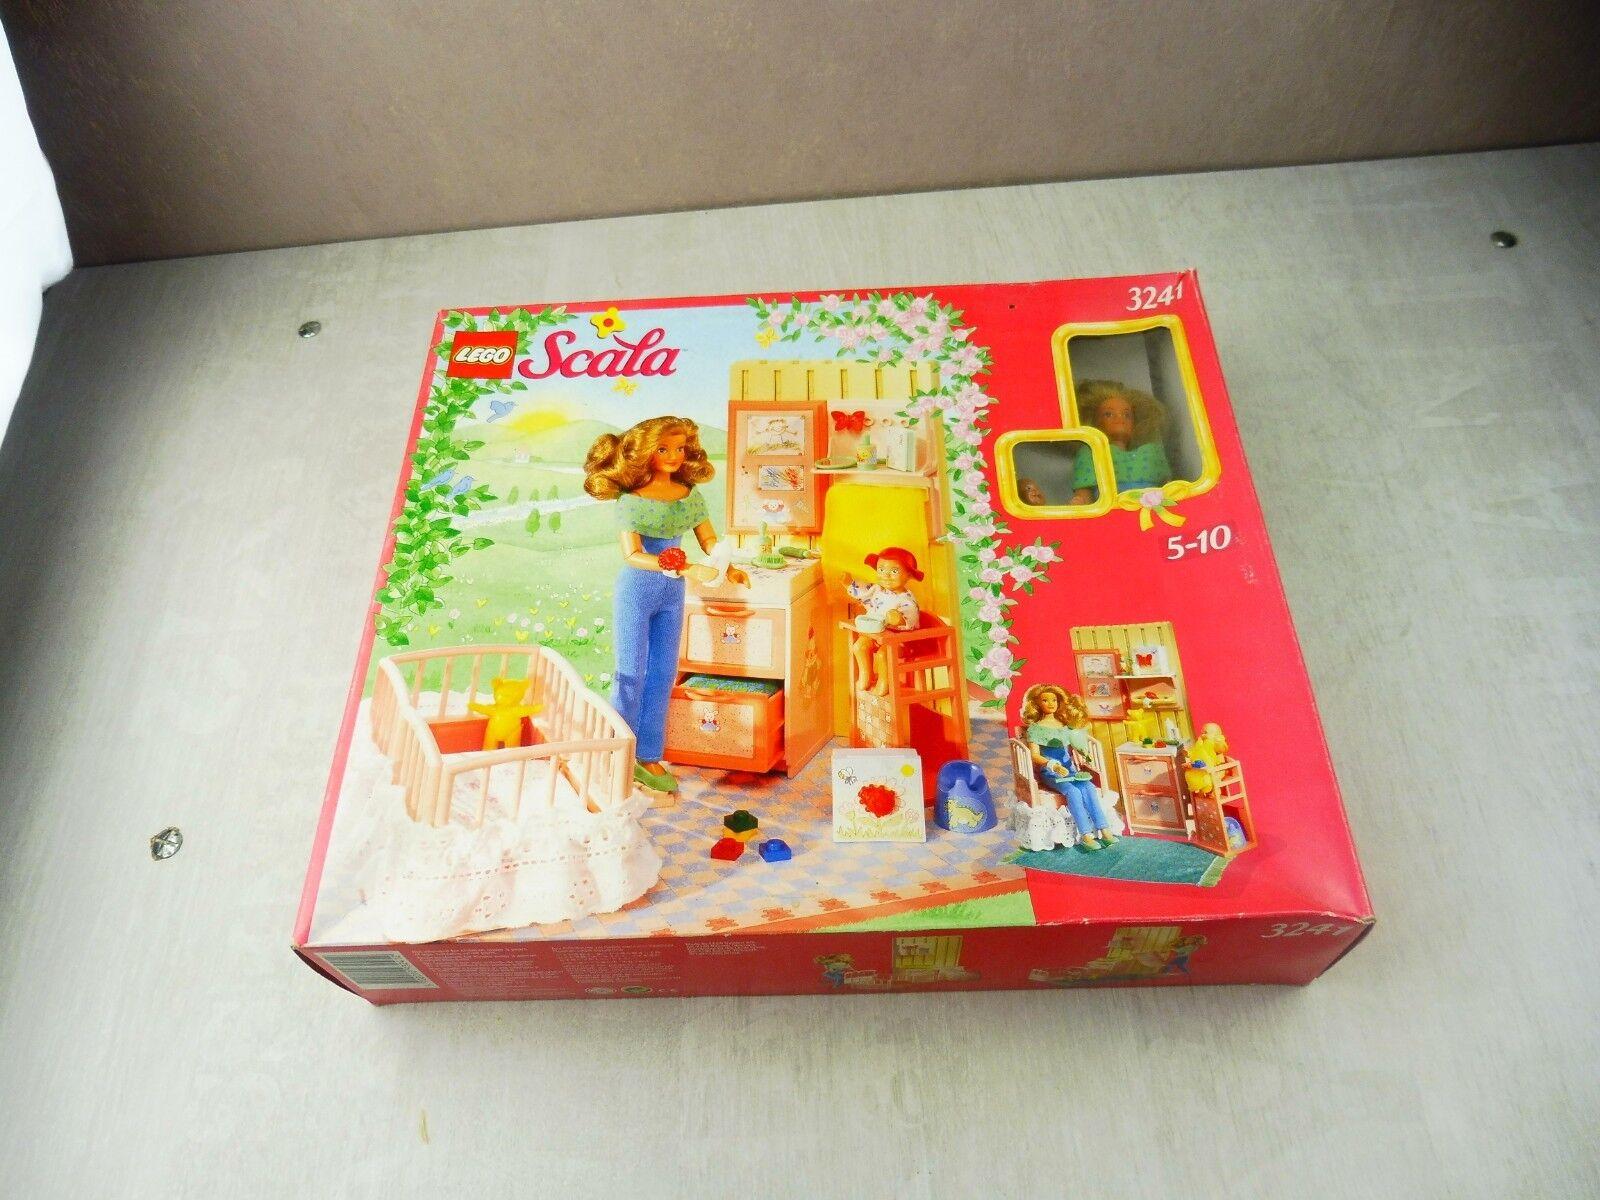 Boîte de Lego la la la chambre de bébé ref. 3241 Lego Scala vintage 9010a7